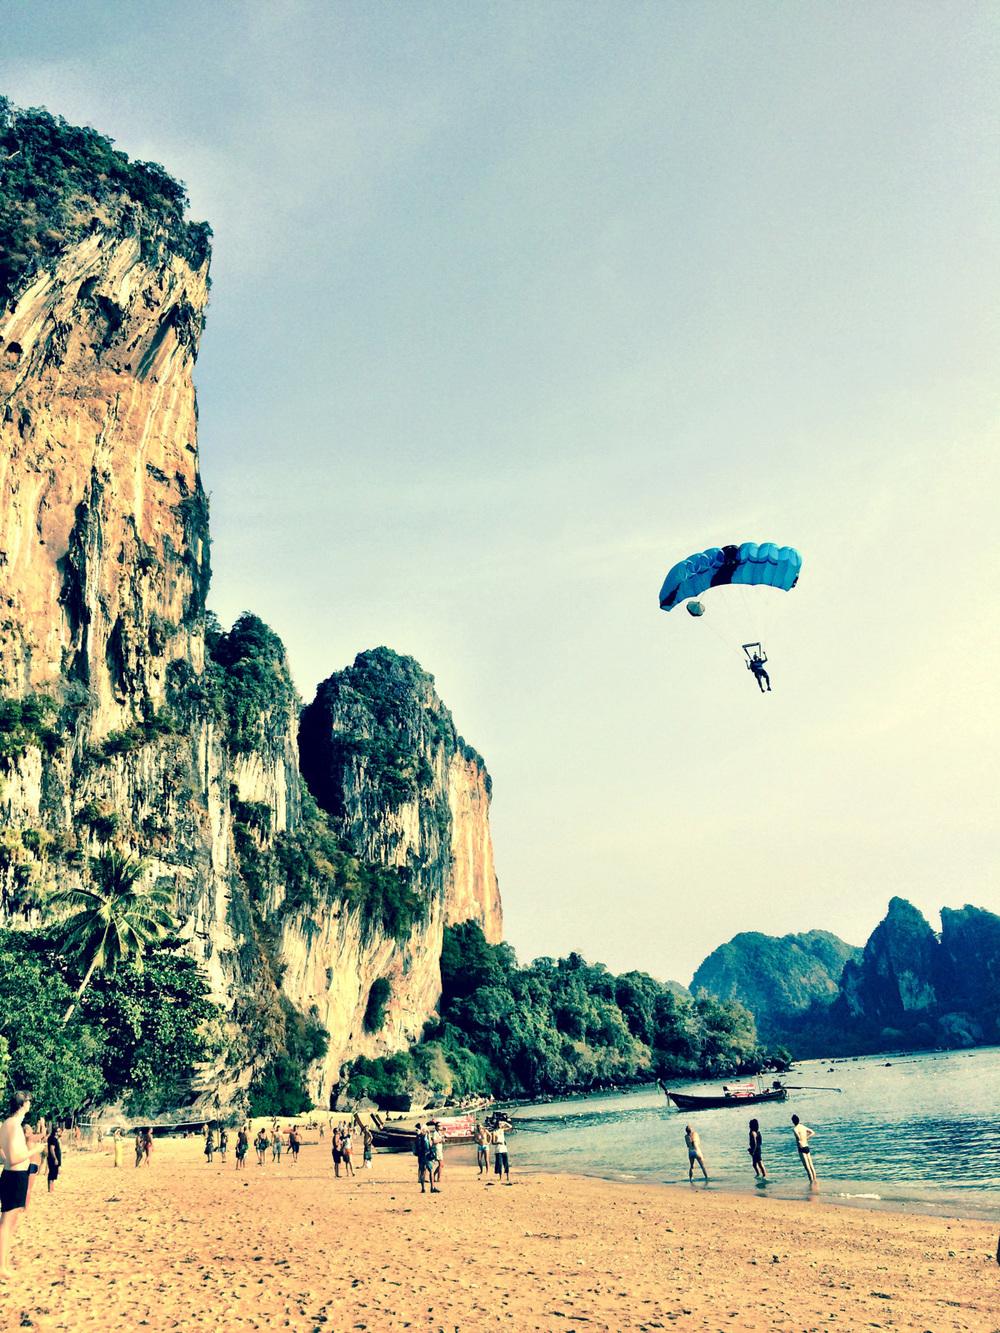 Krabi-Tonsai-Railay-Thailand-AmyRolloPhoto-2459.jpg